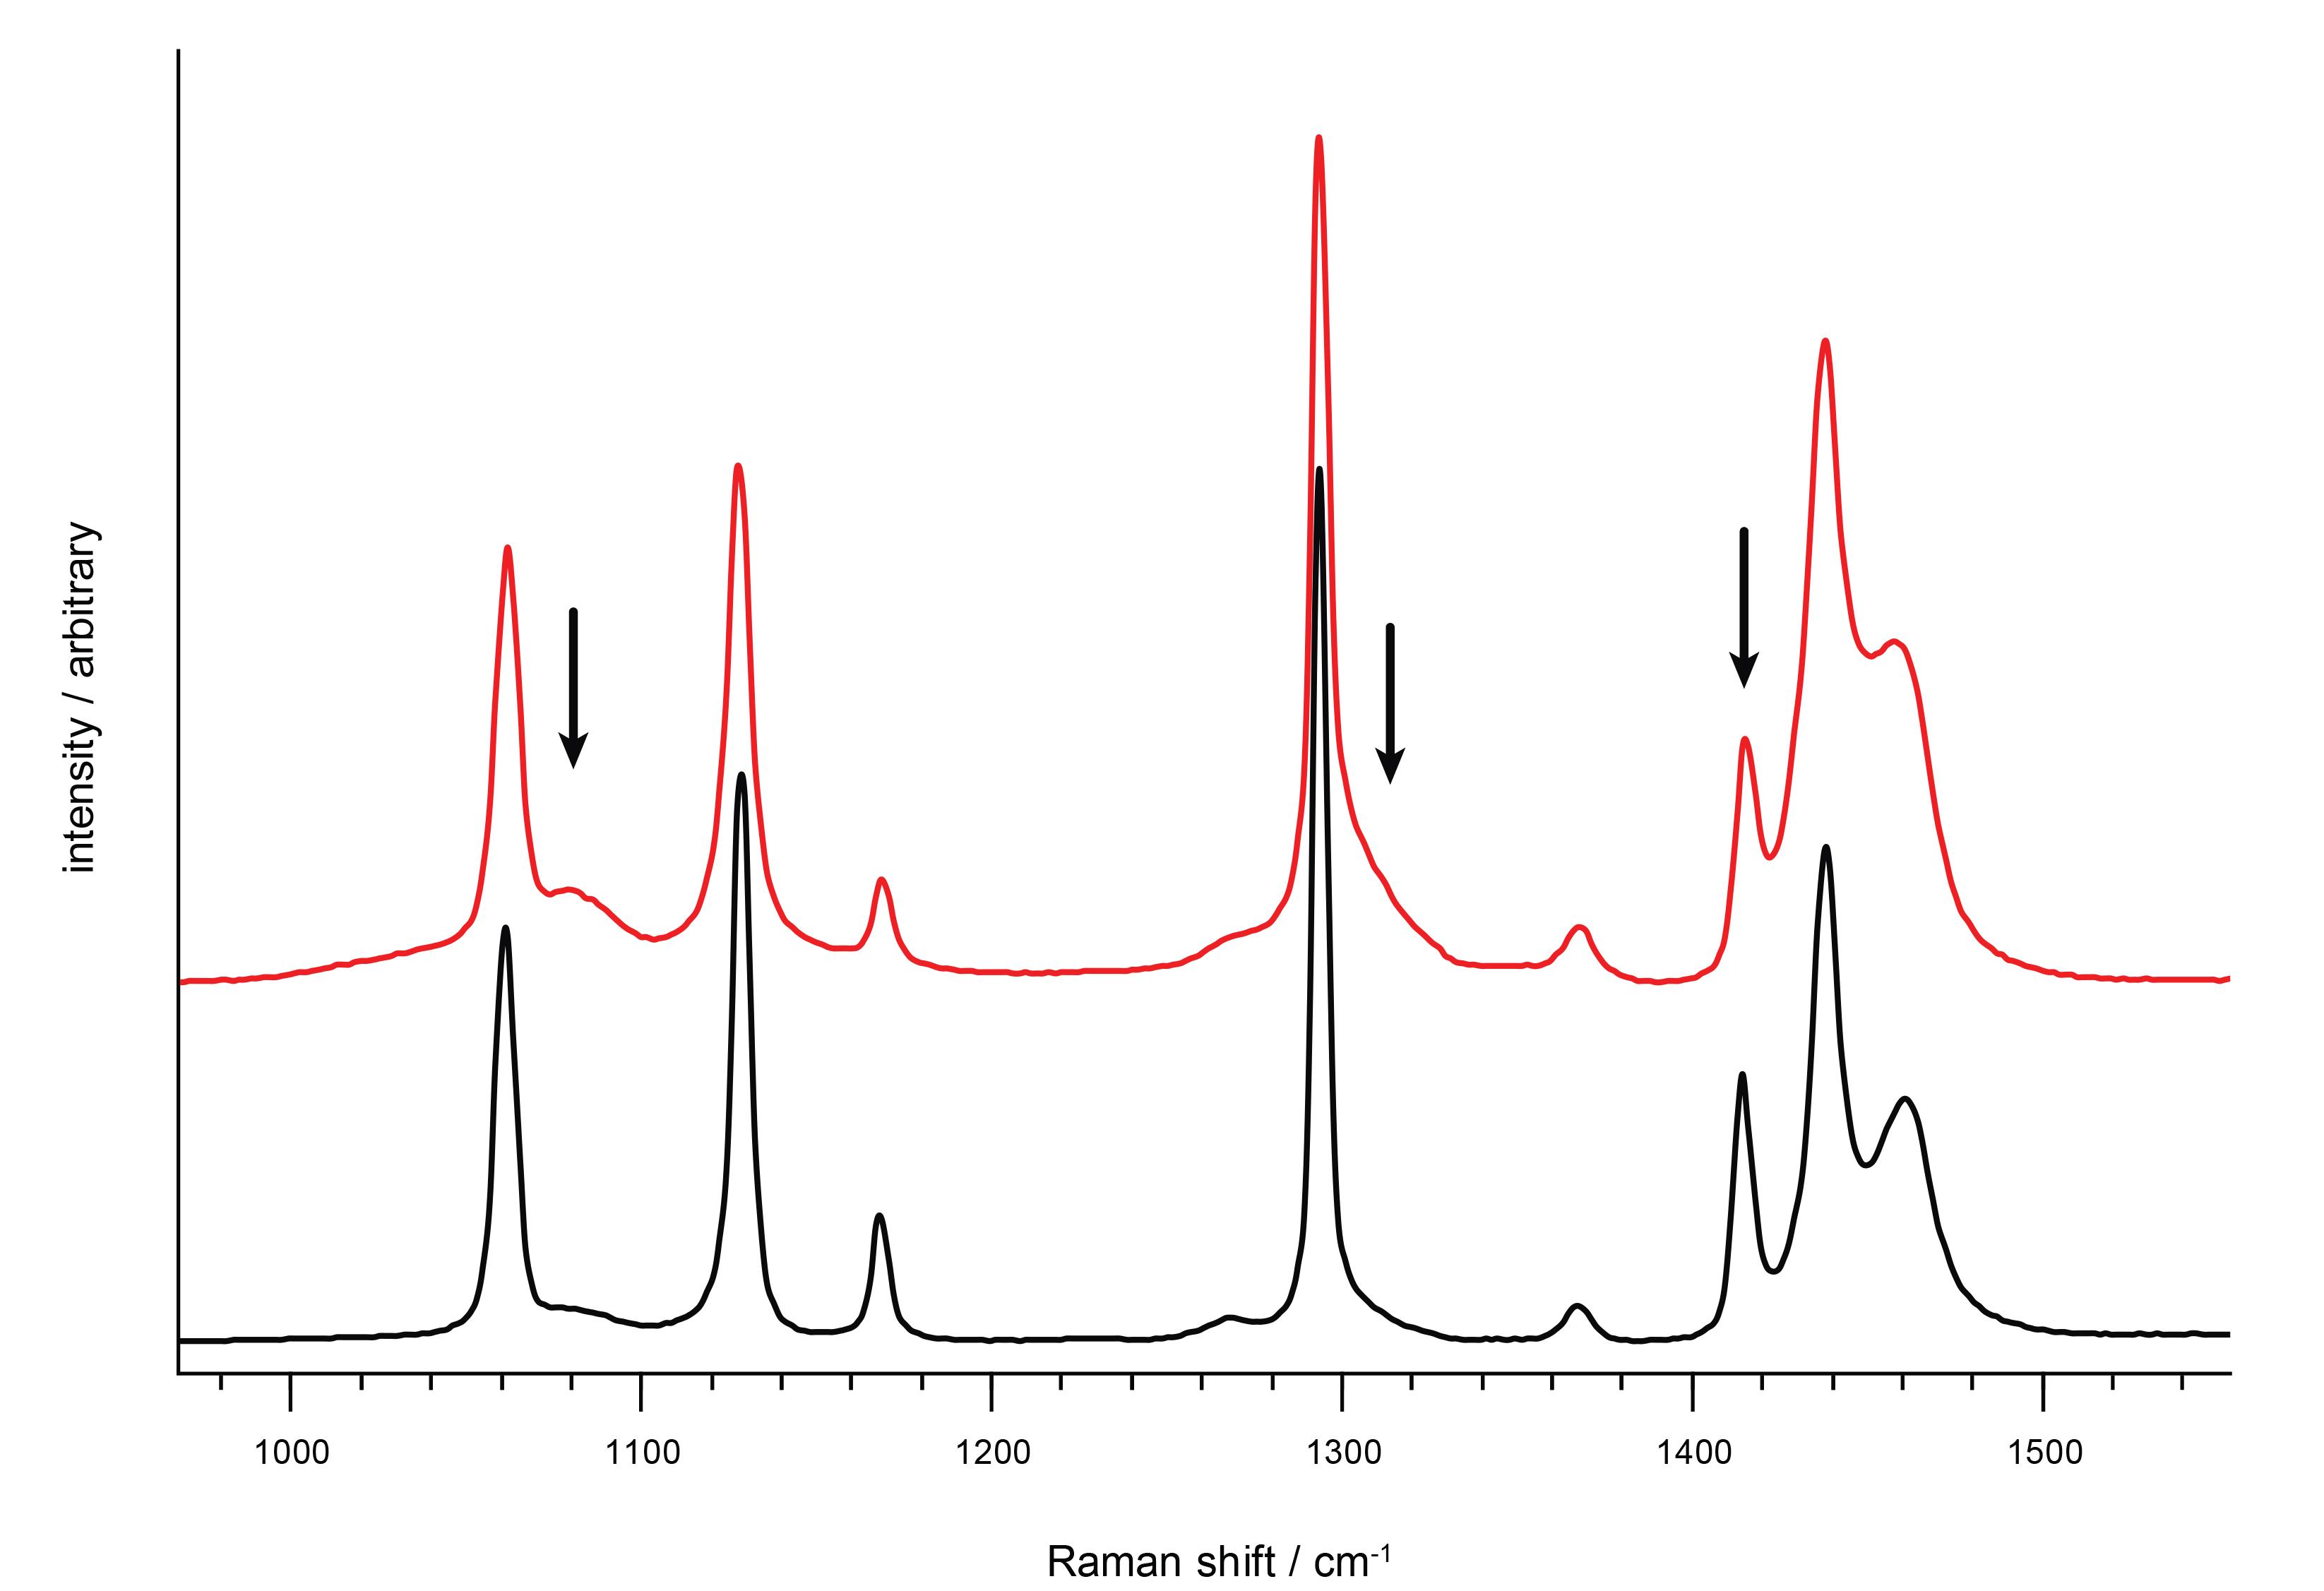 Raman spectra explained